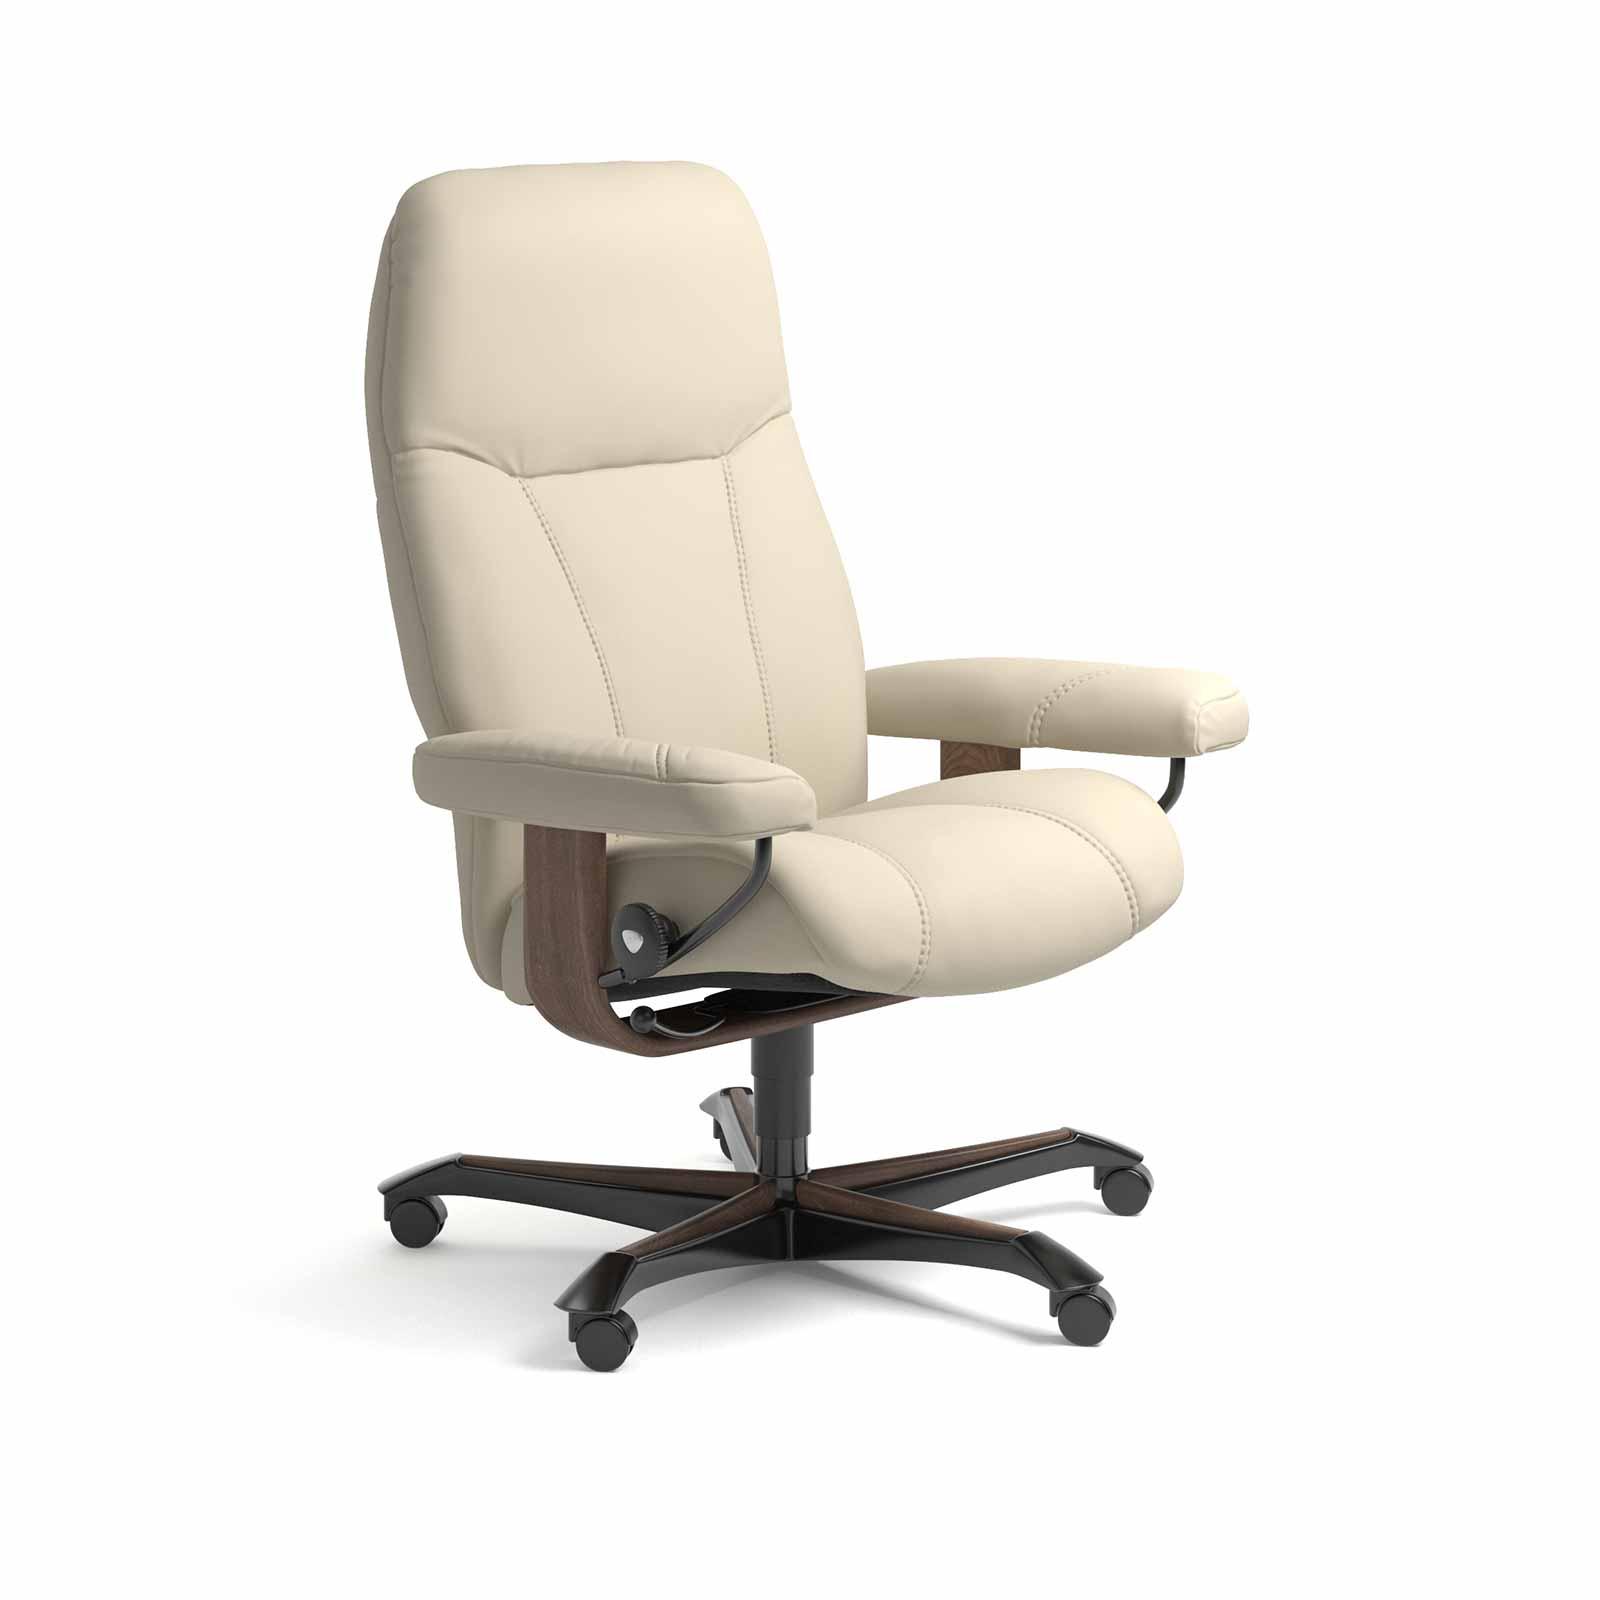 stressless sessel consul home office batick cream stressless. Black Bedroom Furniture Sets. Home Design Ideas